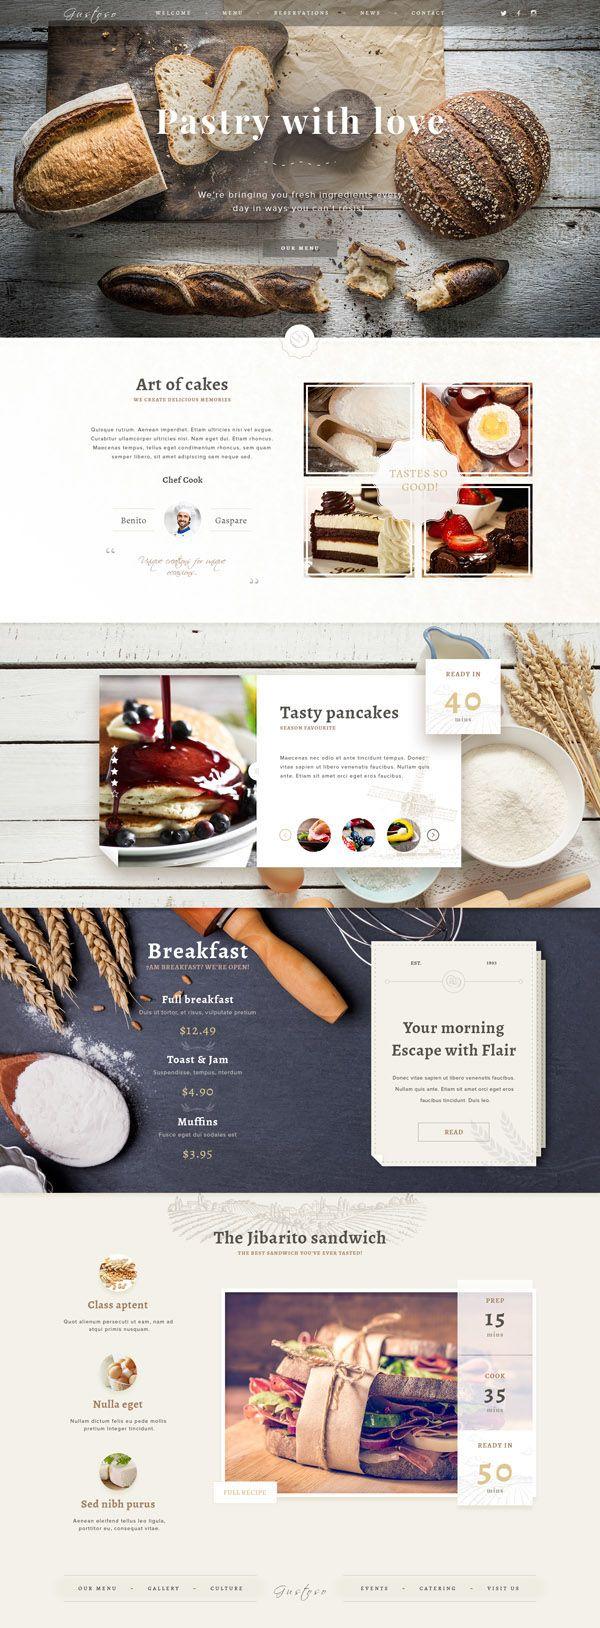 Free Bakery PSD Web Template on Behance